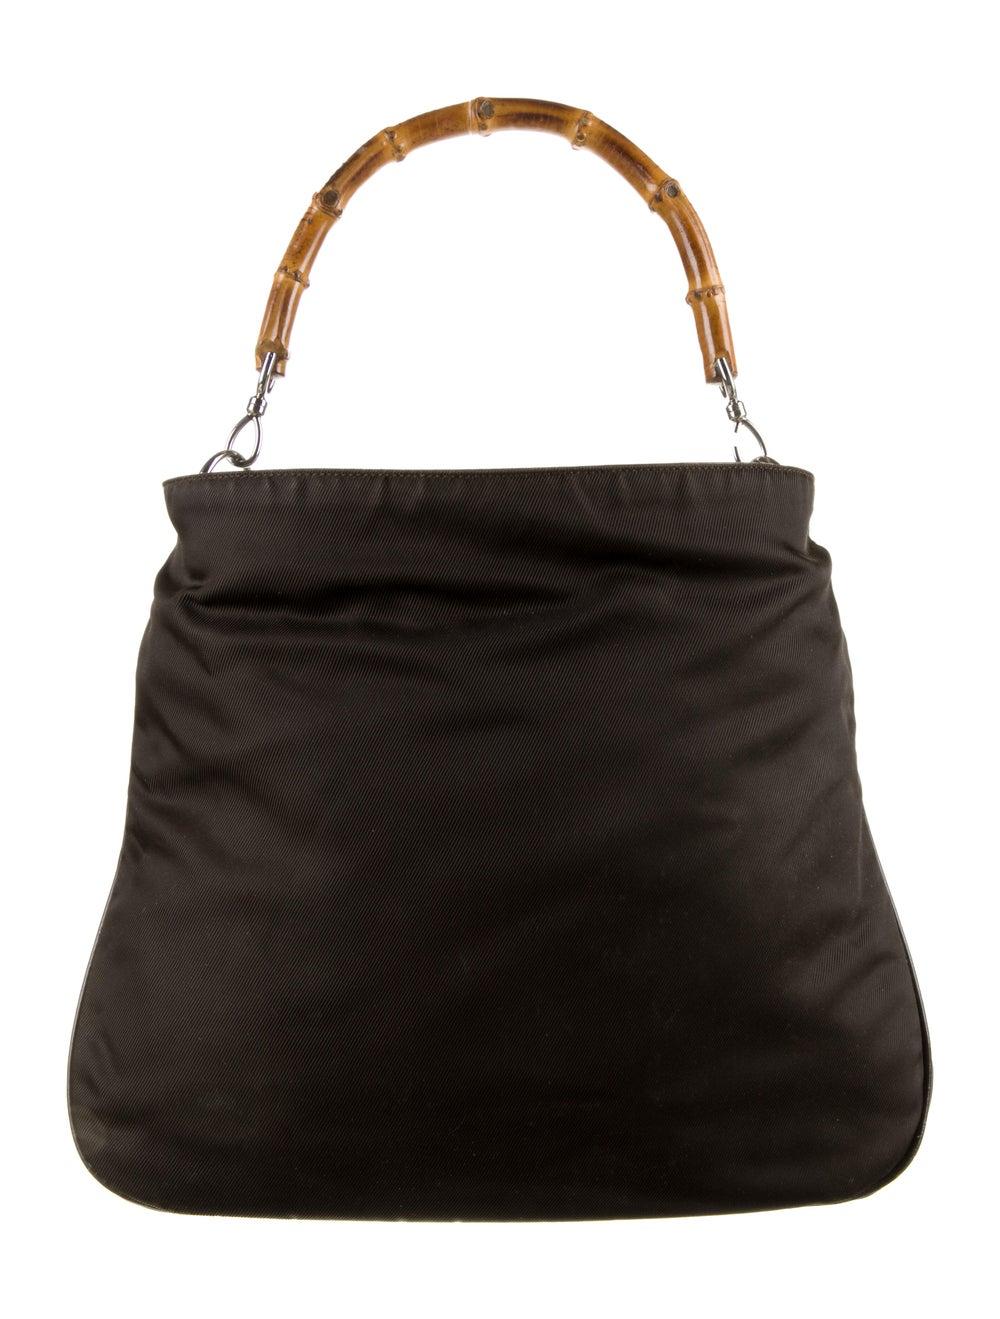 Gucci Vintage Bamboo Handle Bag Brown - image 4